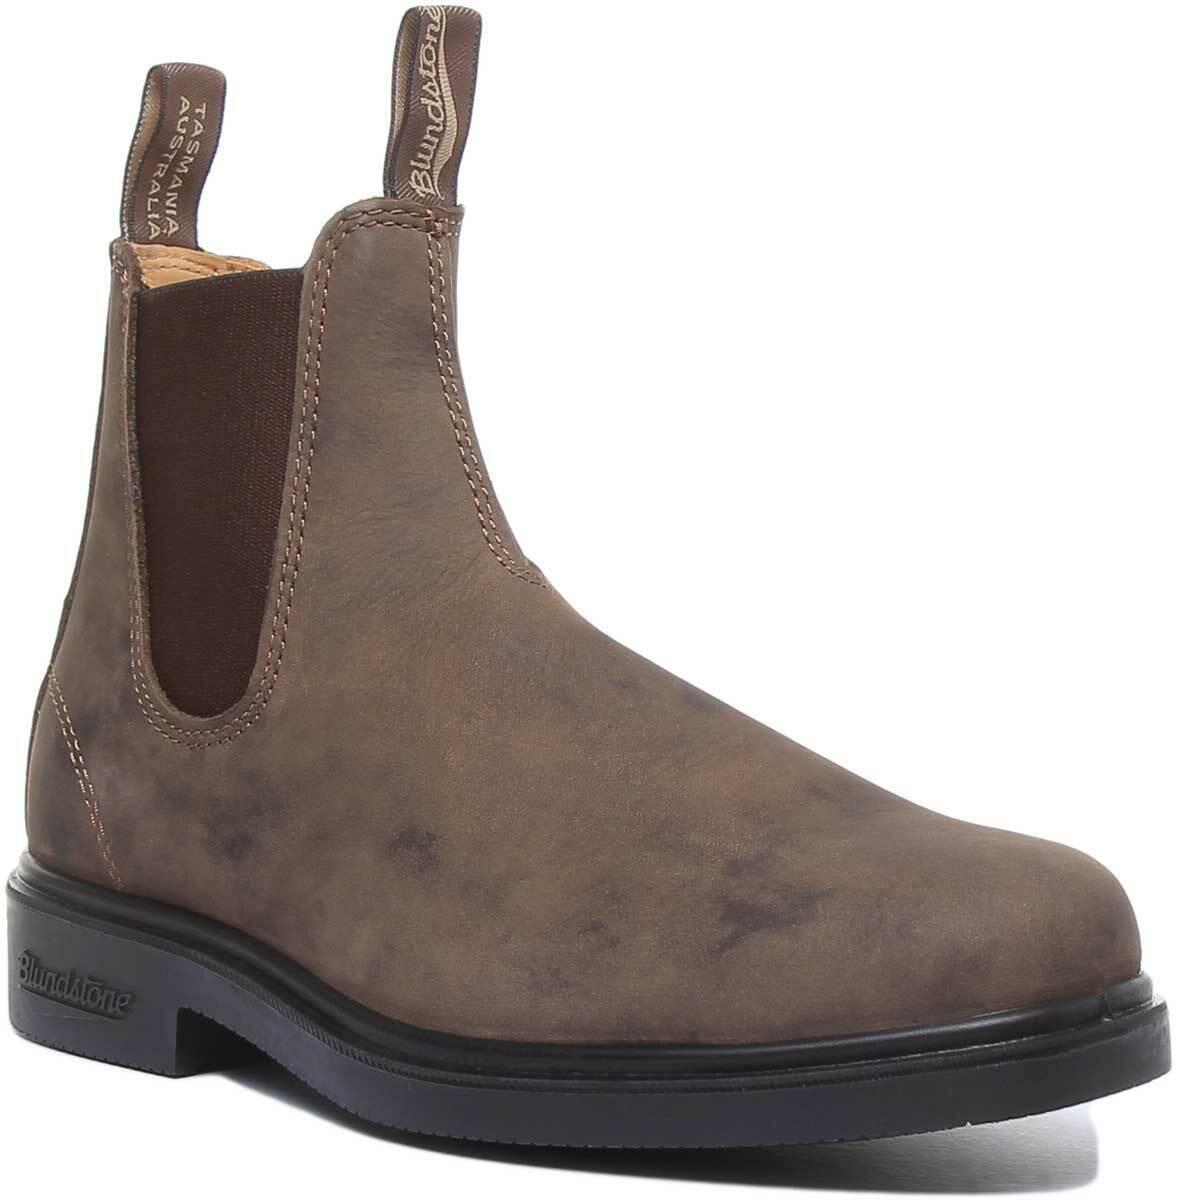 Blaundstone 1306 Mens Leather Ankle Chelsea Stiefel In Rustic braun UK Größes 6 - 12